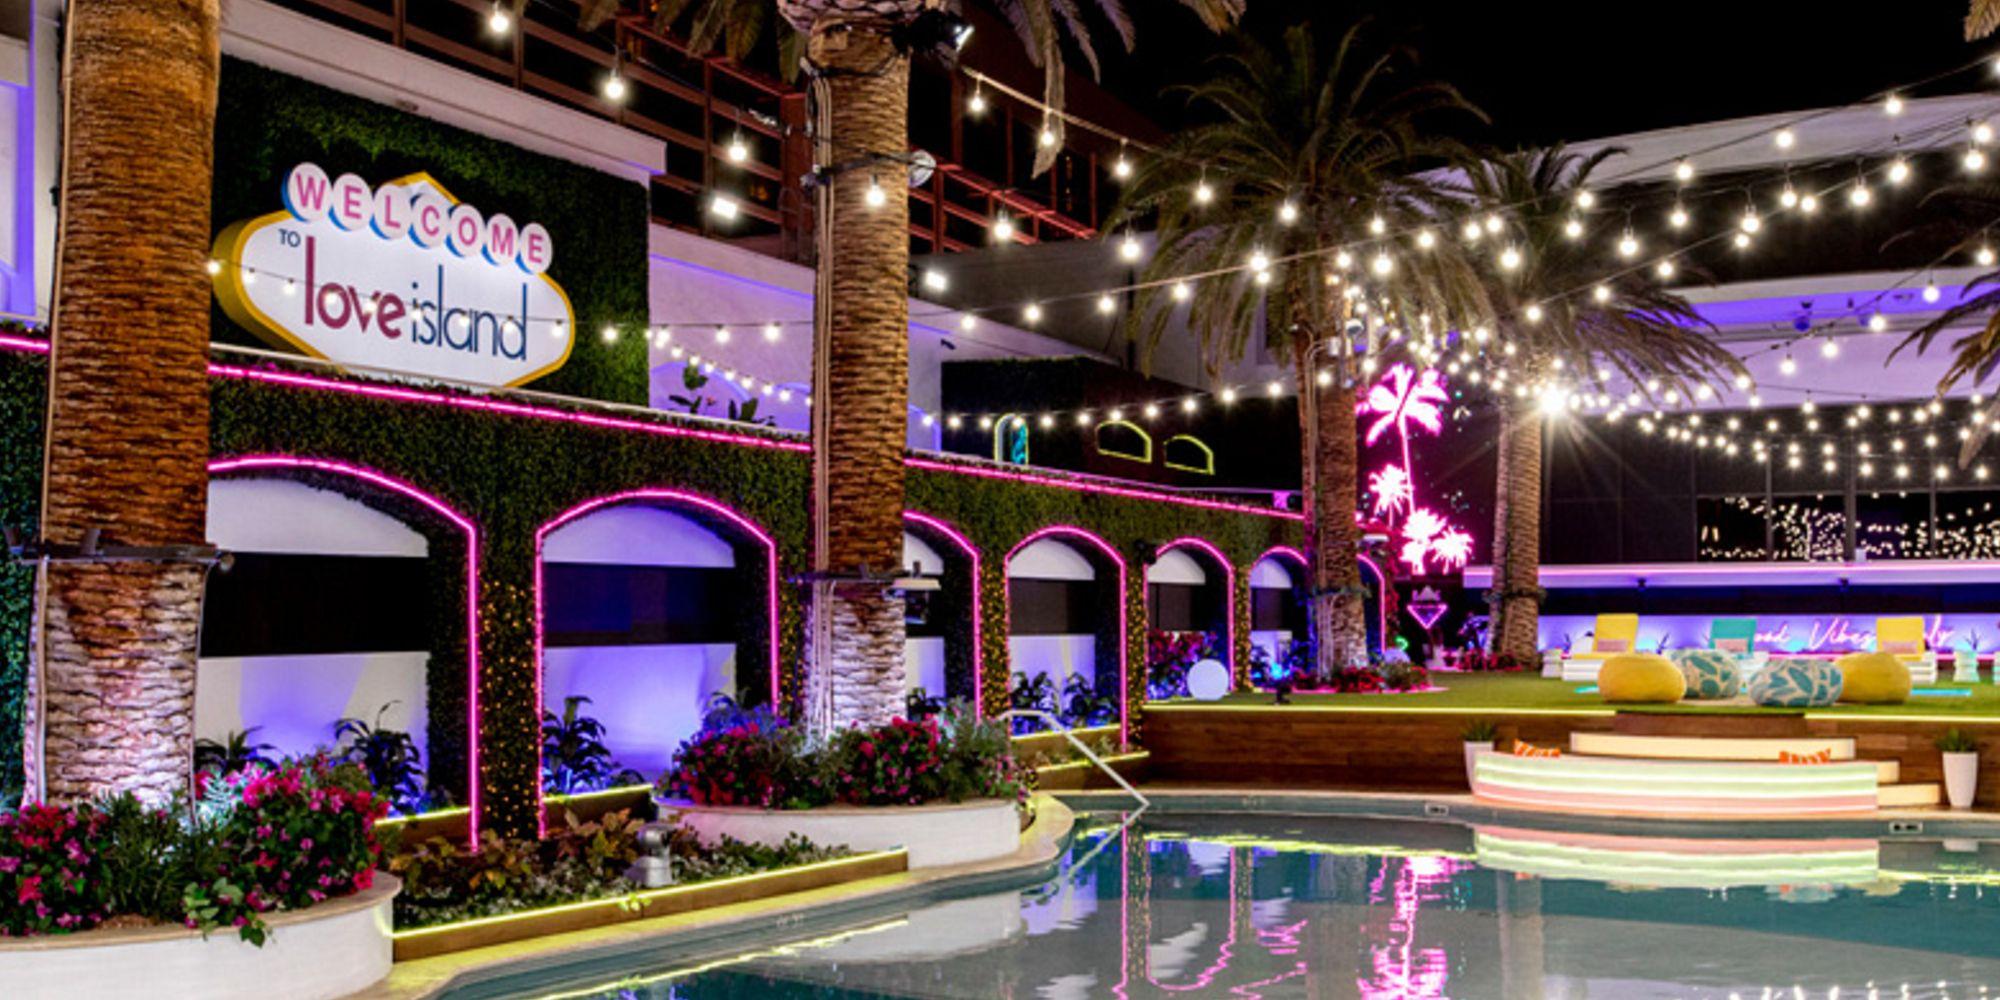 Love Island USA: Where In Las Vegas Is Season 2 Being Filmed?